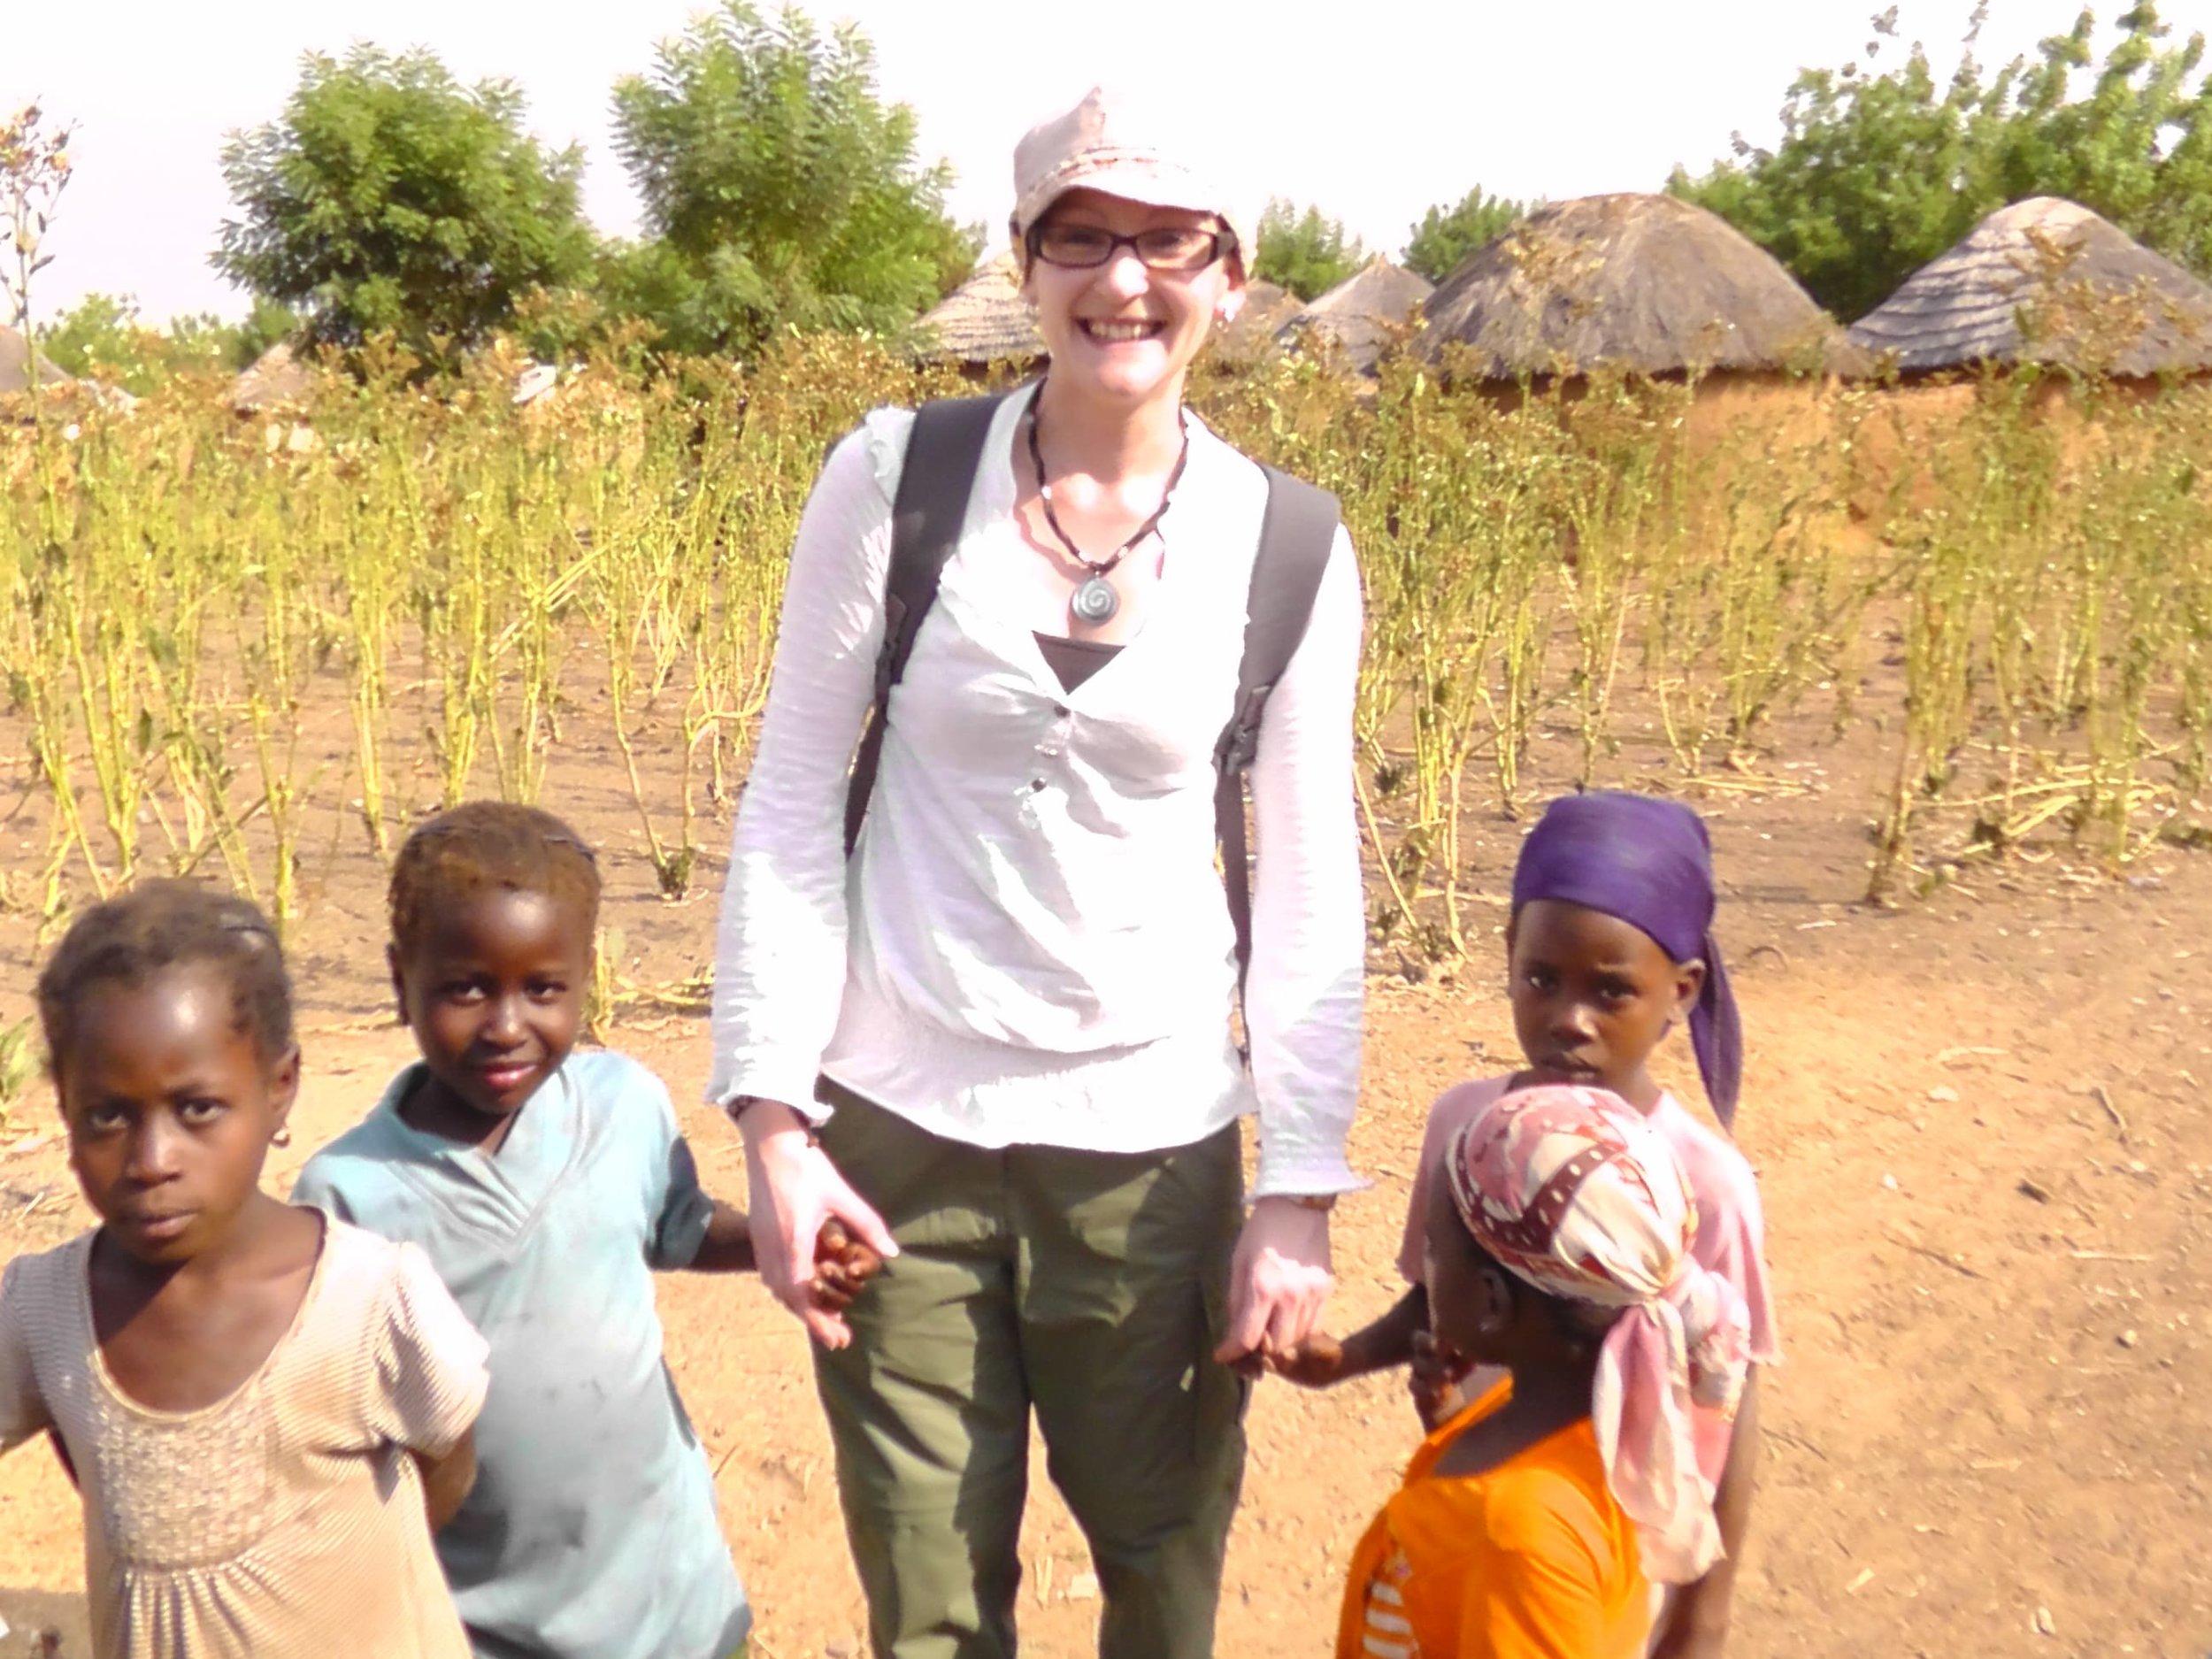 ghana-expedition-jan-2013-update-3-min.jpg